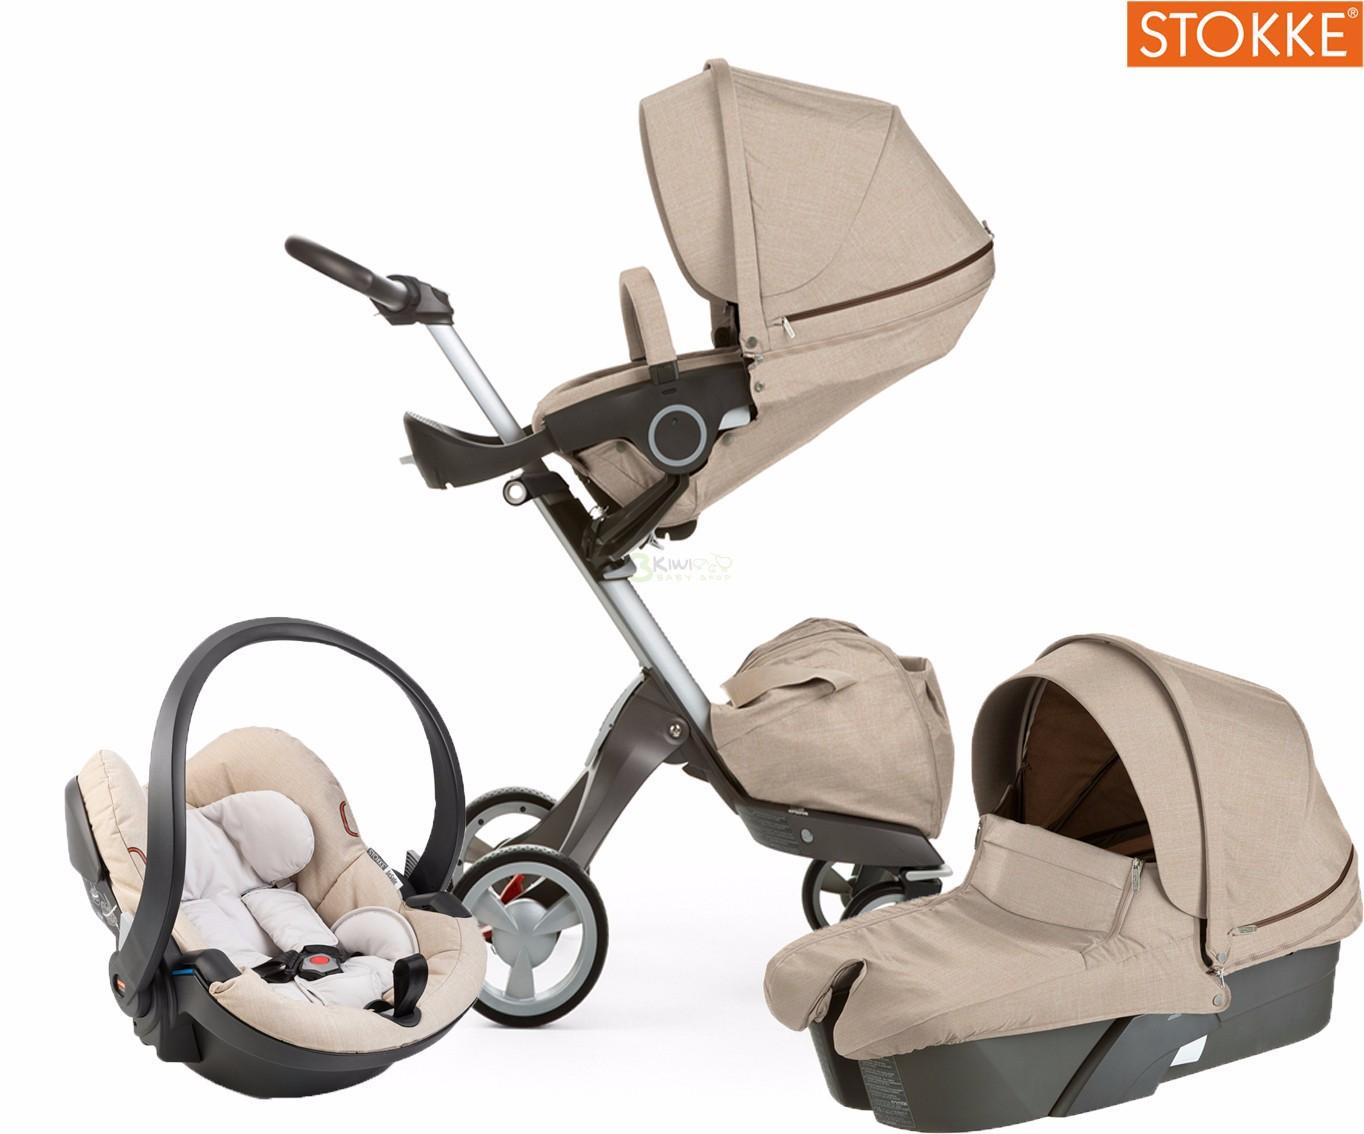 stokke xplory v4 neugeborenen kinderwagen transport scheibbs suchergebnisse. Black Bedroom Furniture Sets. Home Design Ideas